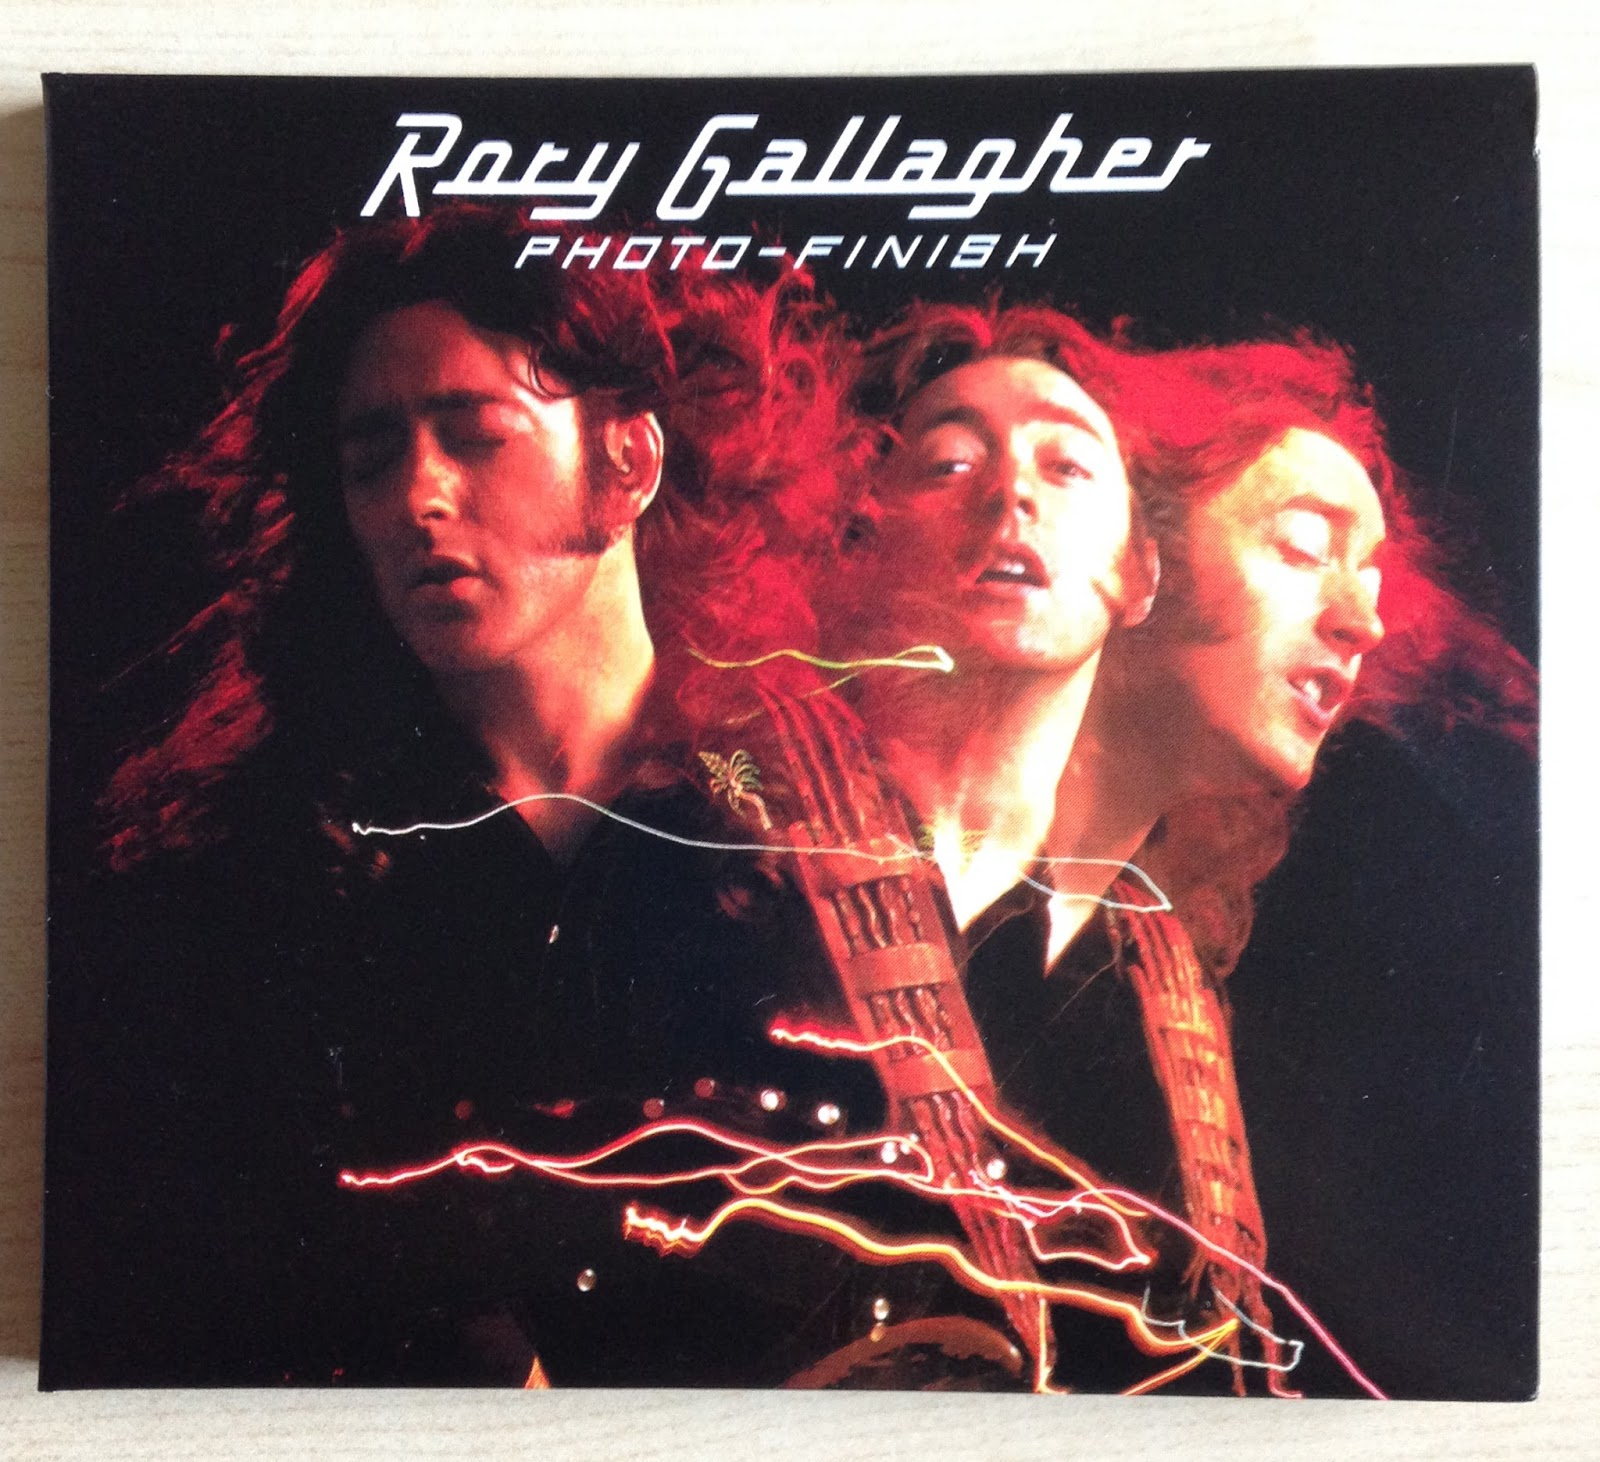 Rory+Gallagher+-+Photo-Finish+%2528Mine+